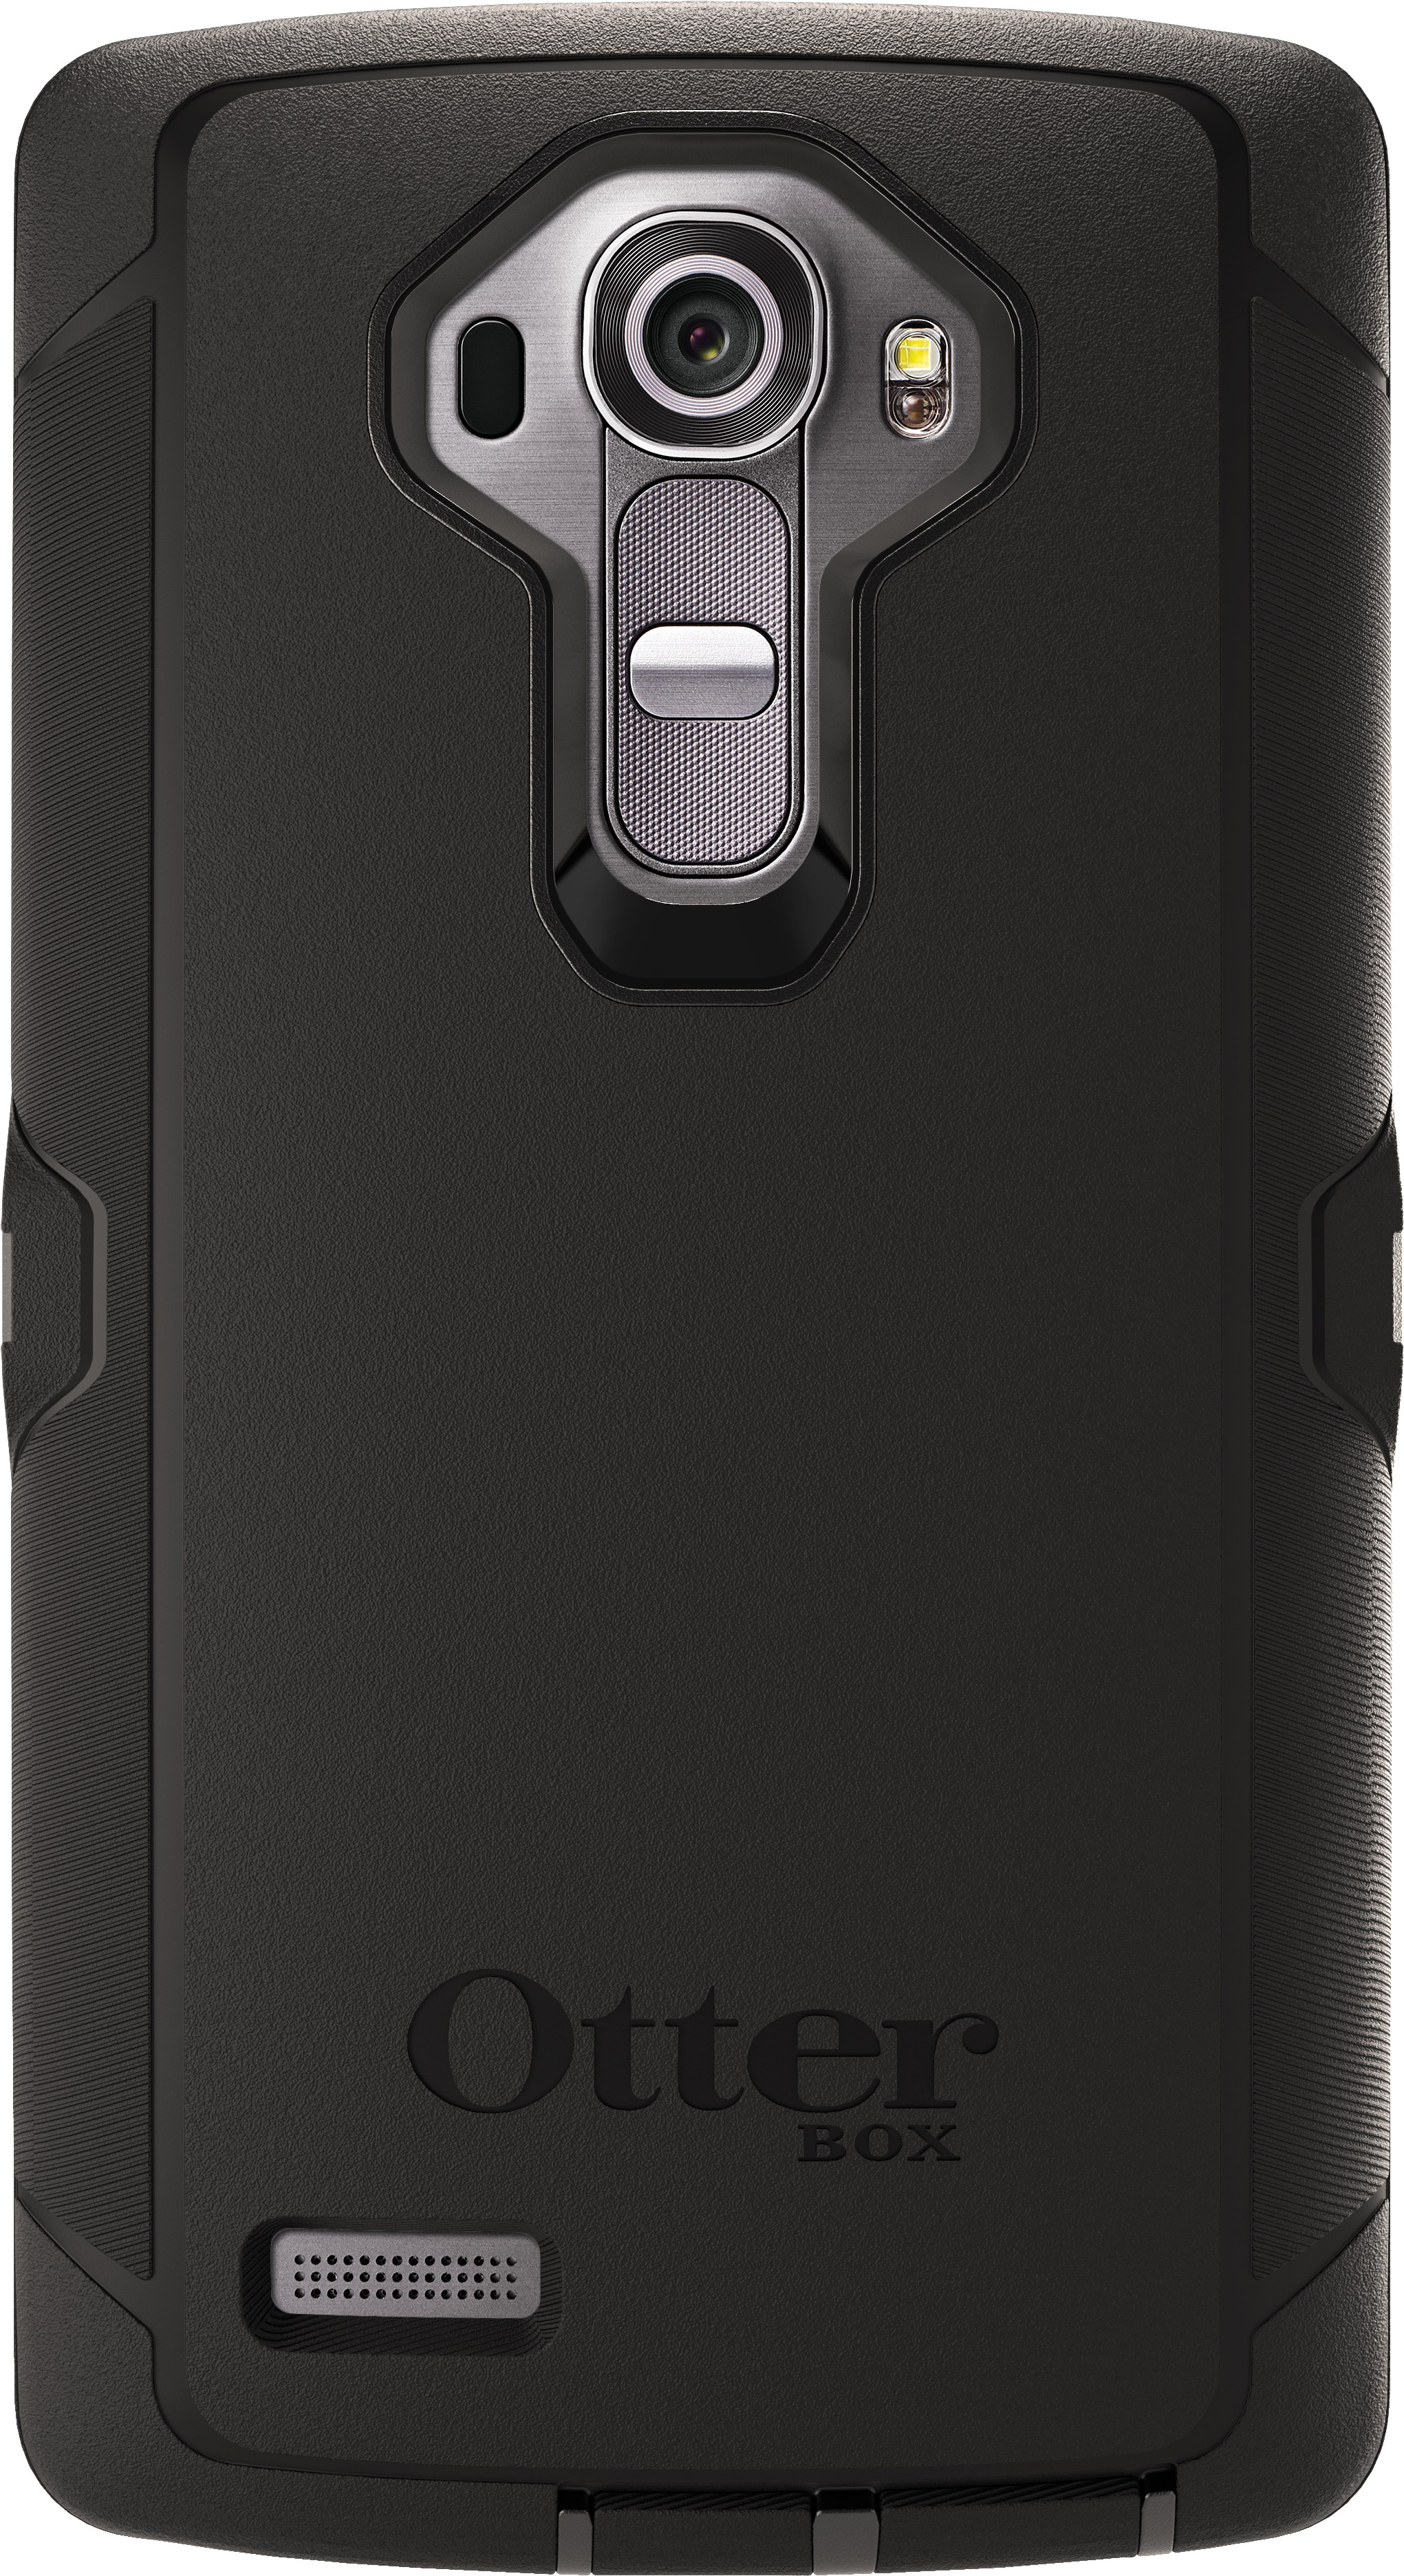 OtterBox Defender Series for LG G4